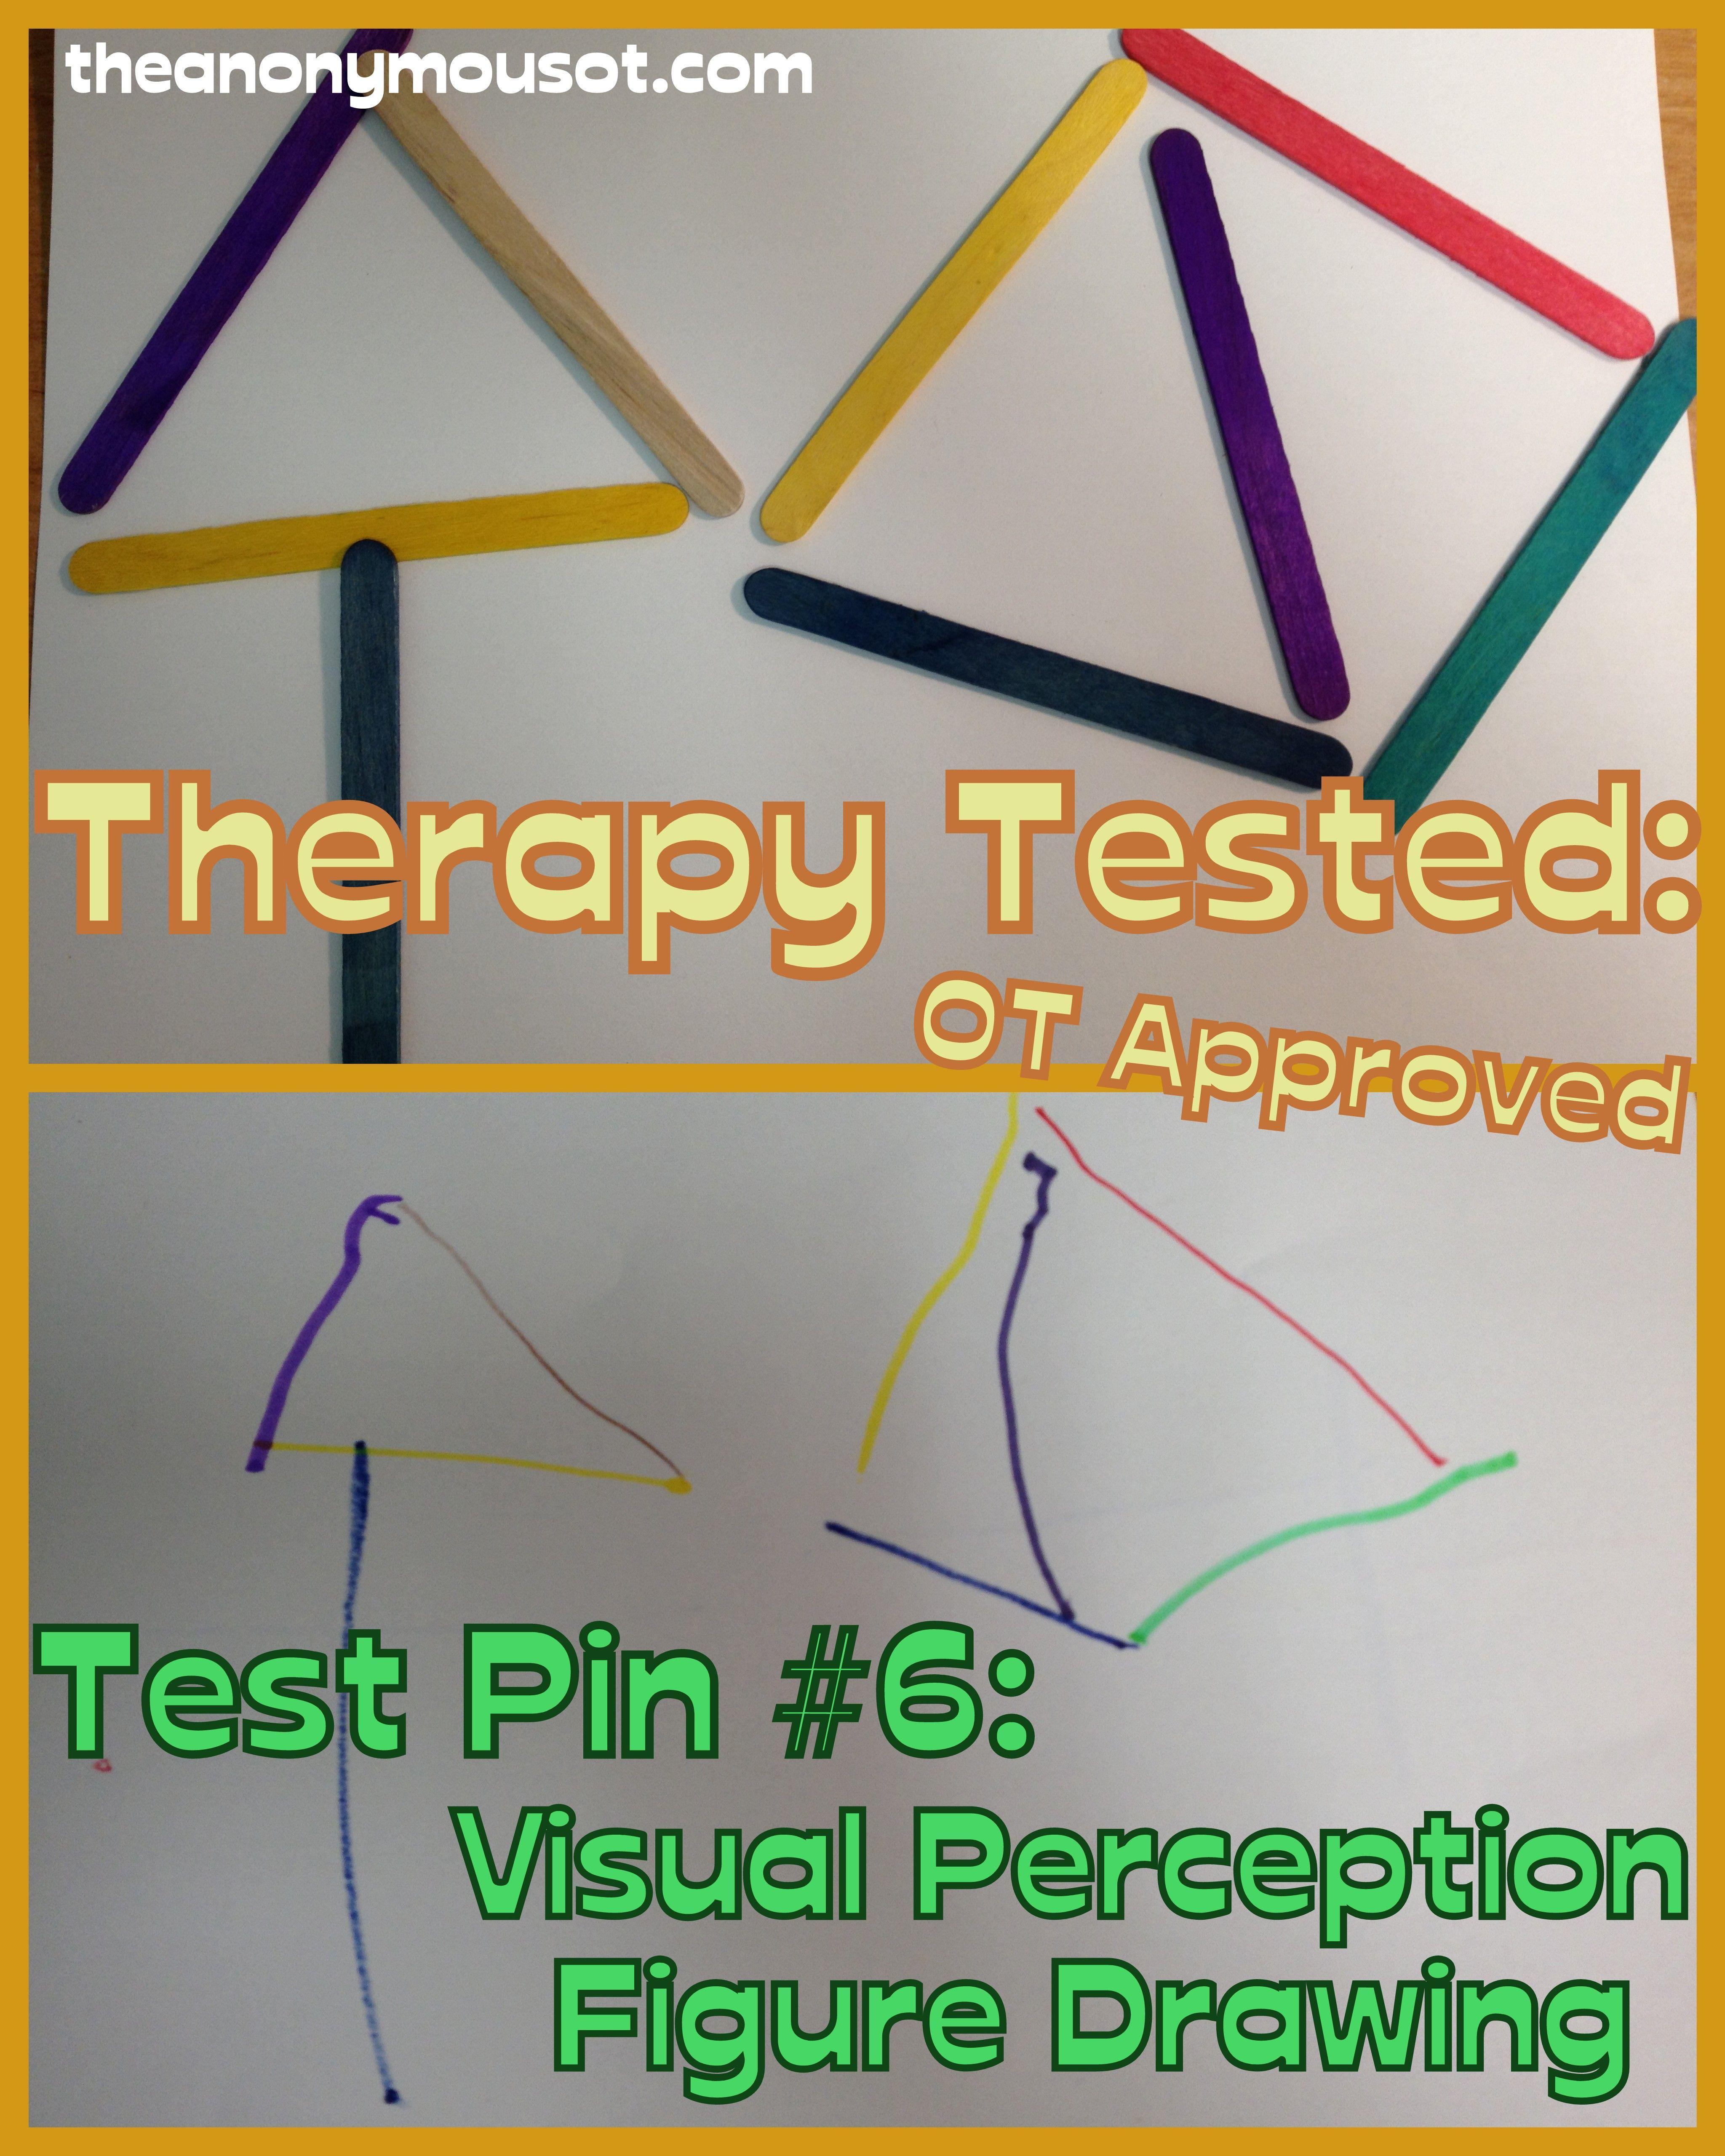 Visual Perception Figure Drawing